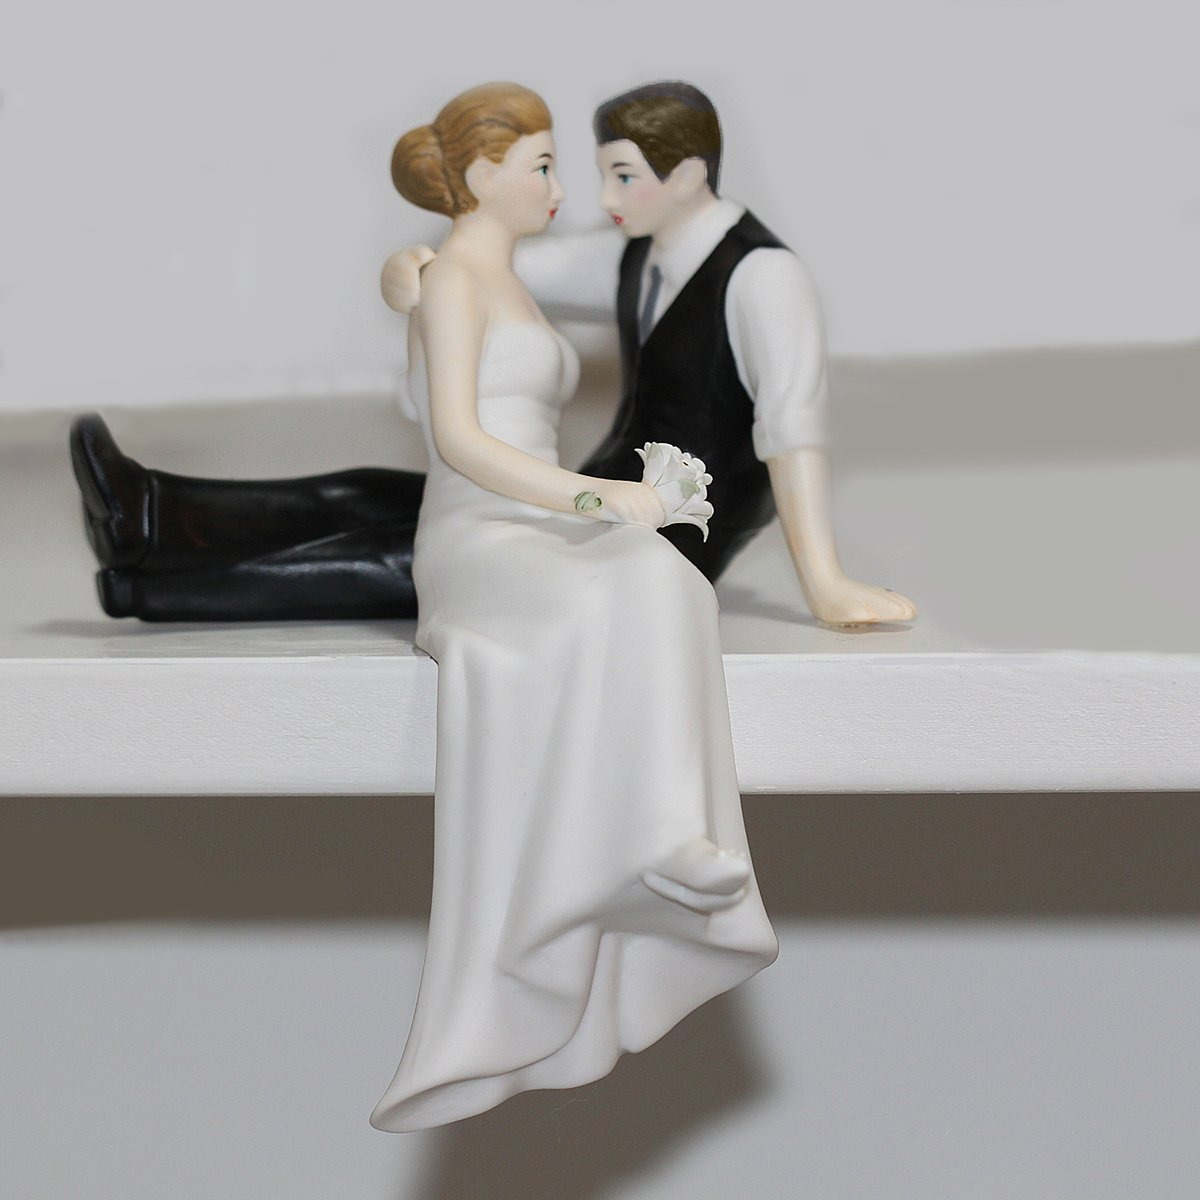 All Things Weddings Loving Look Bride and Groom Couple Wedding Cake Topper